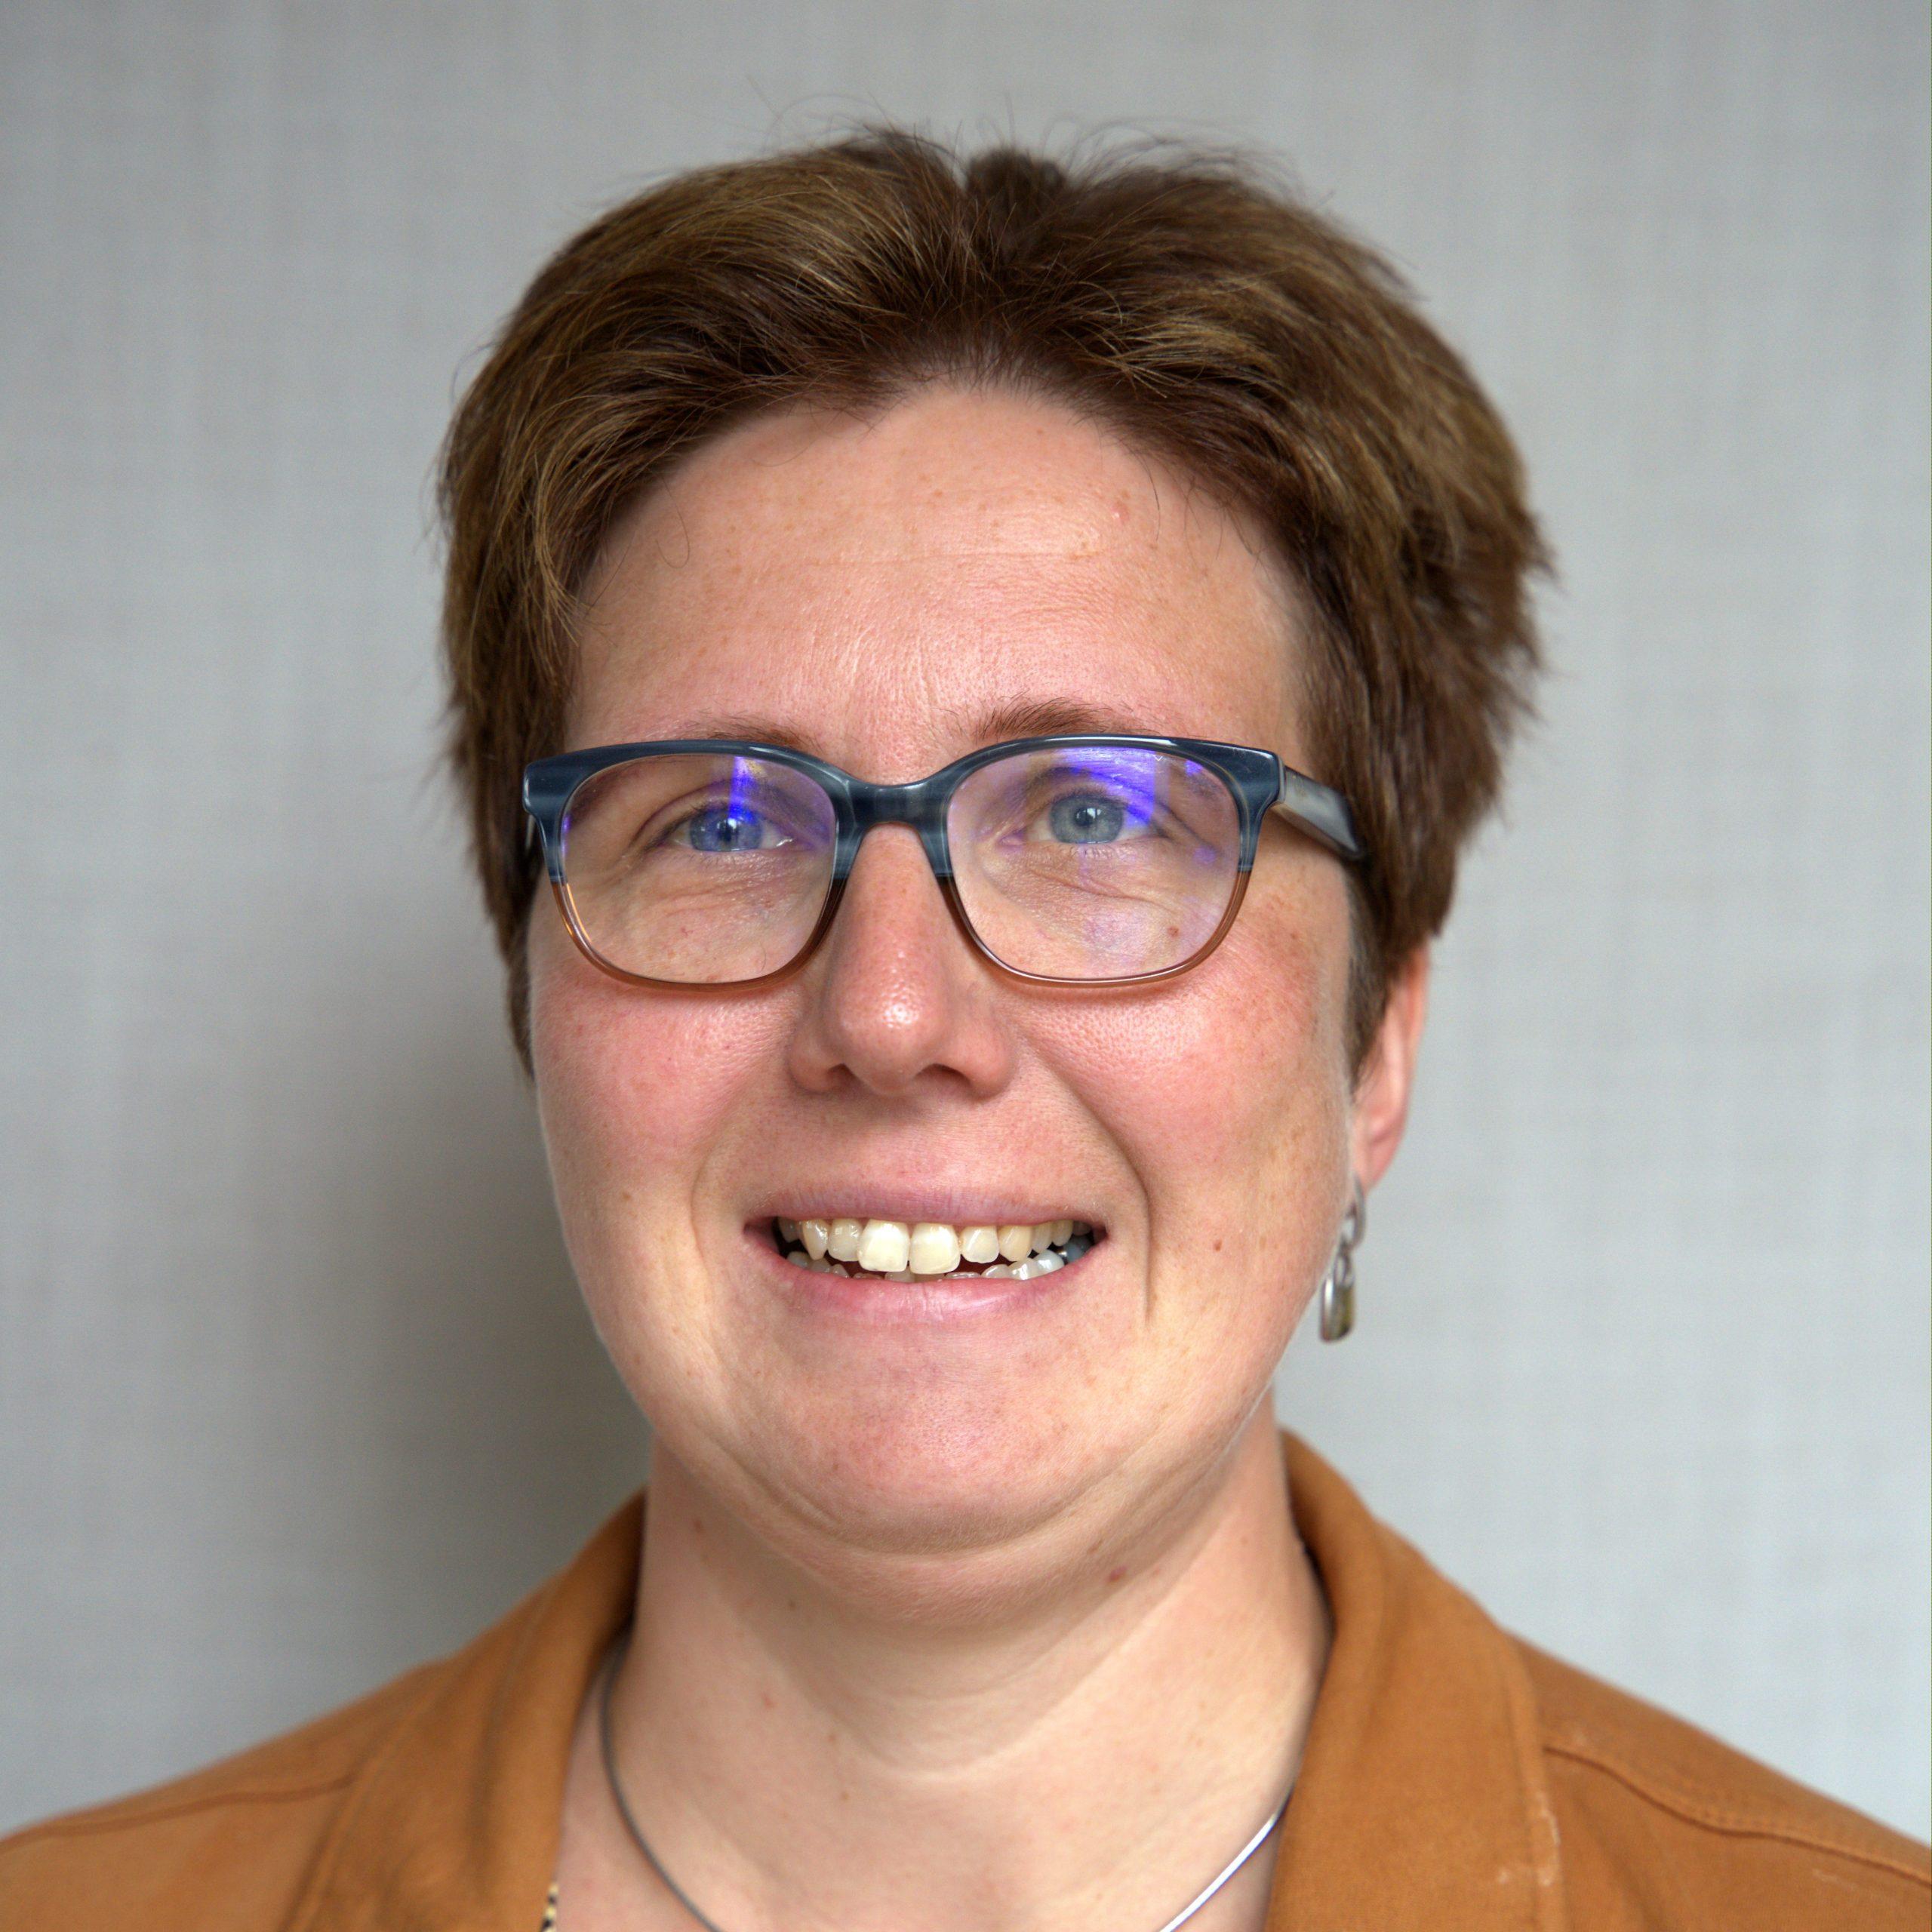 Oa Ina Van Der Wal Vierkant